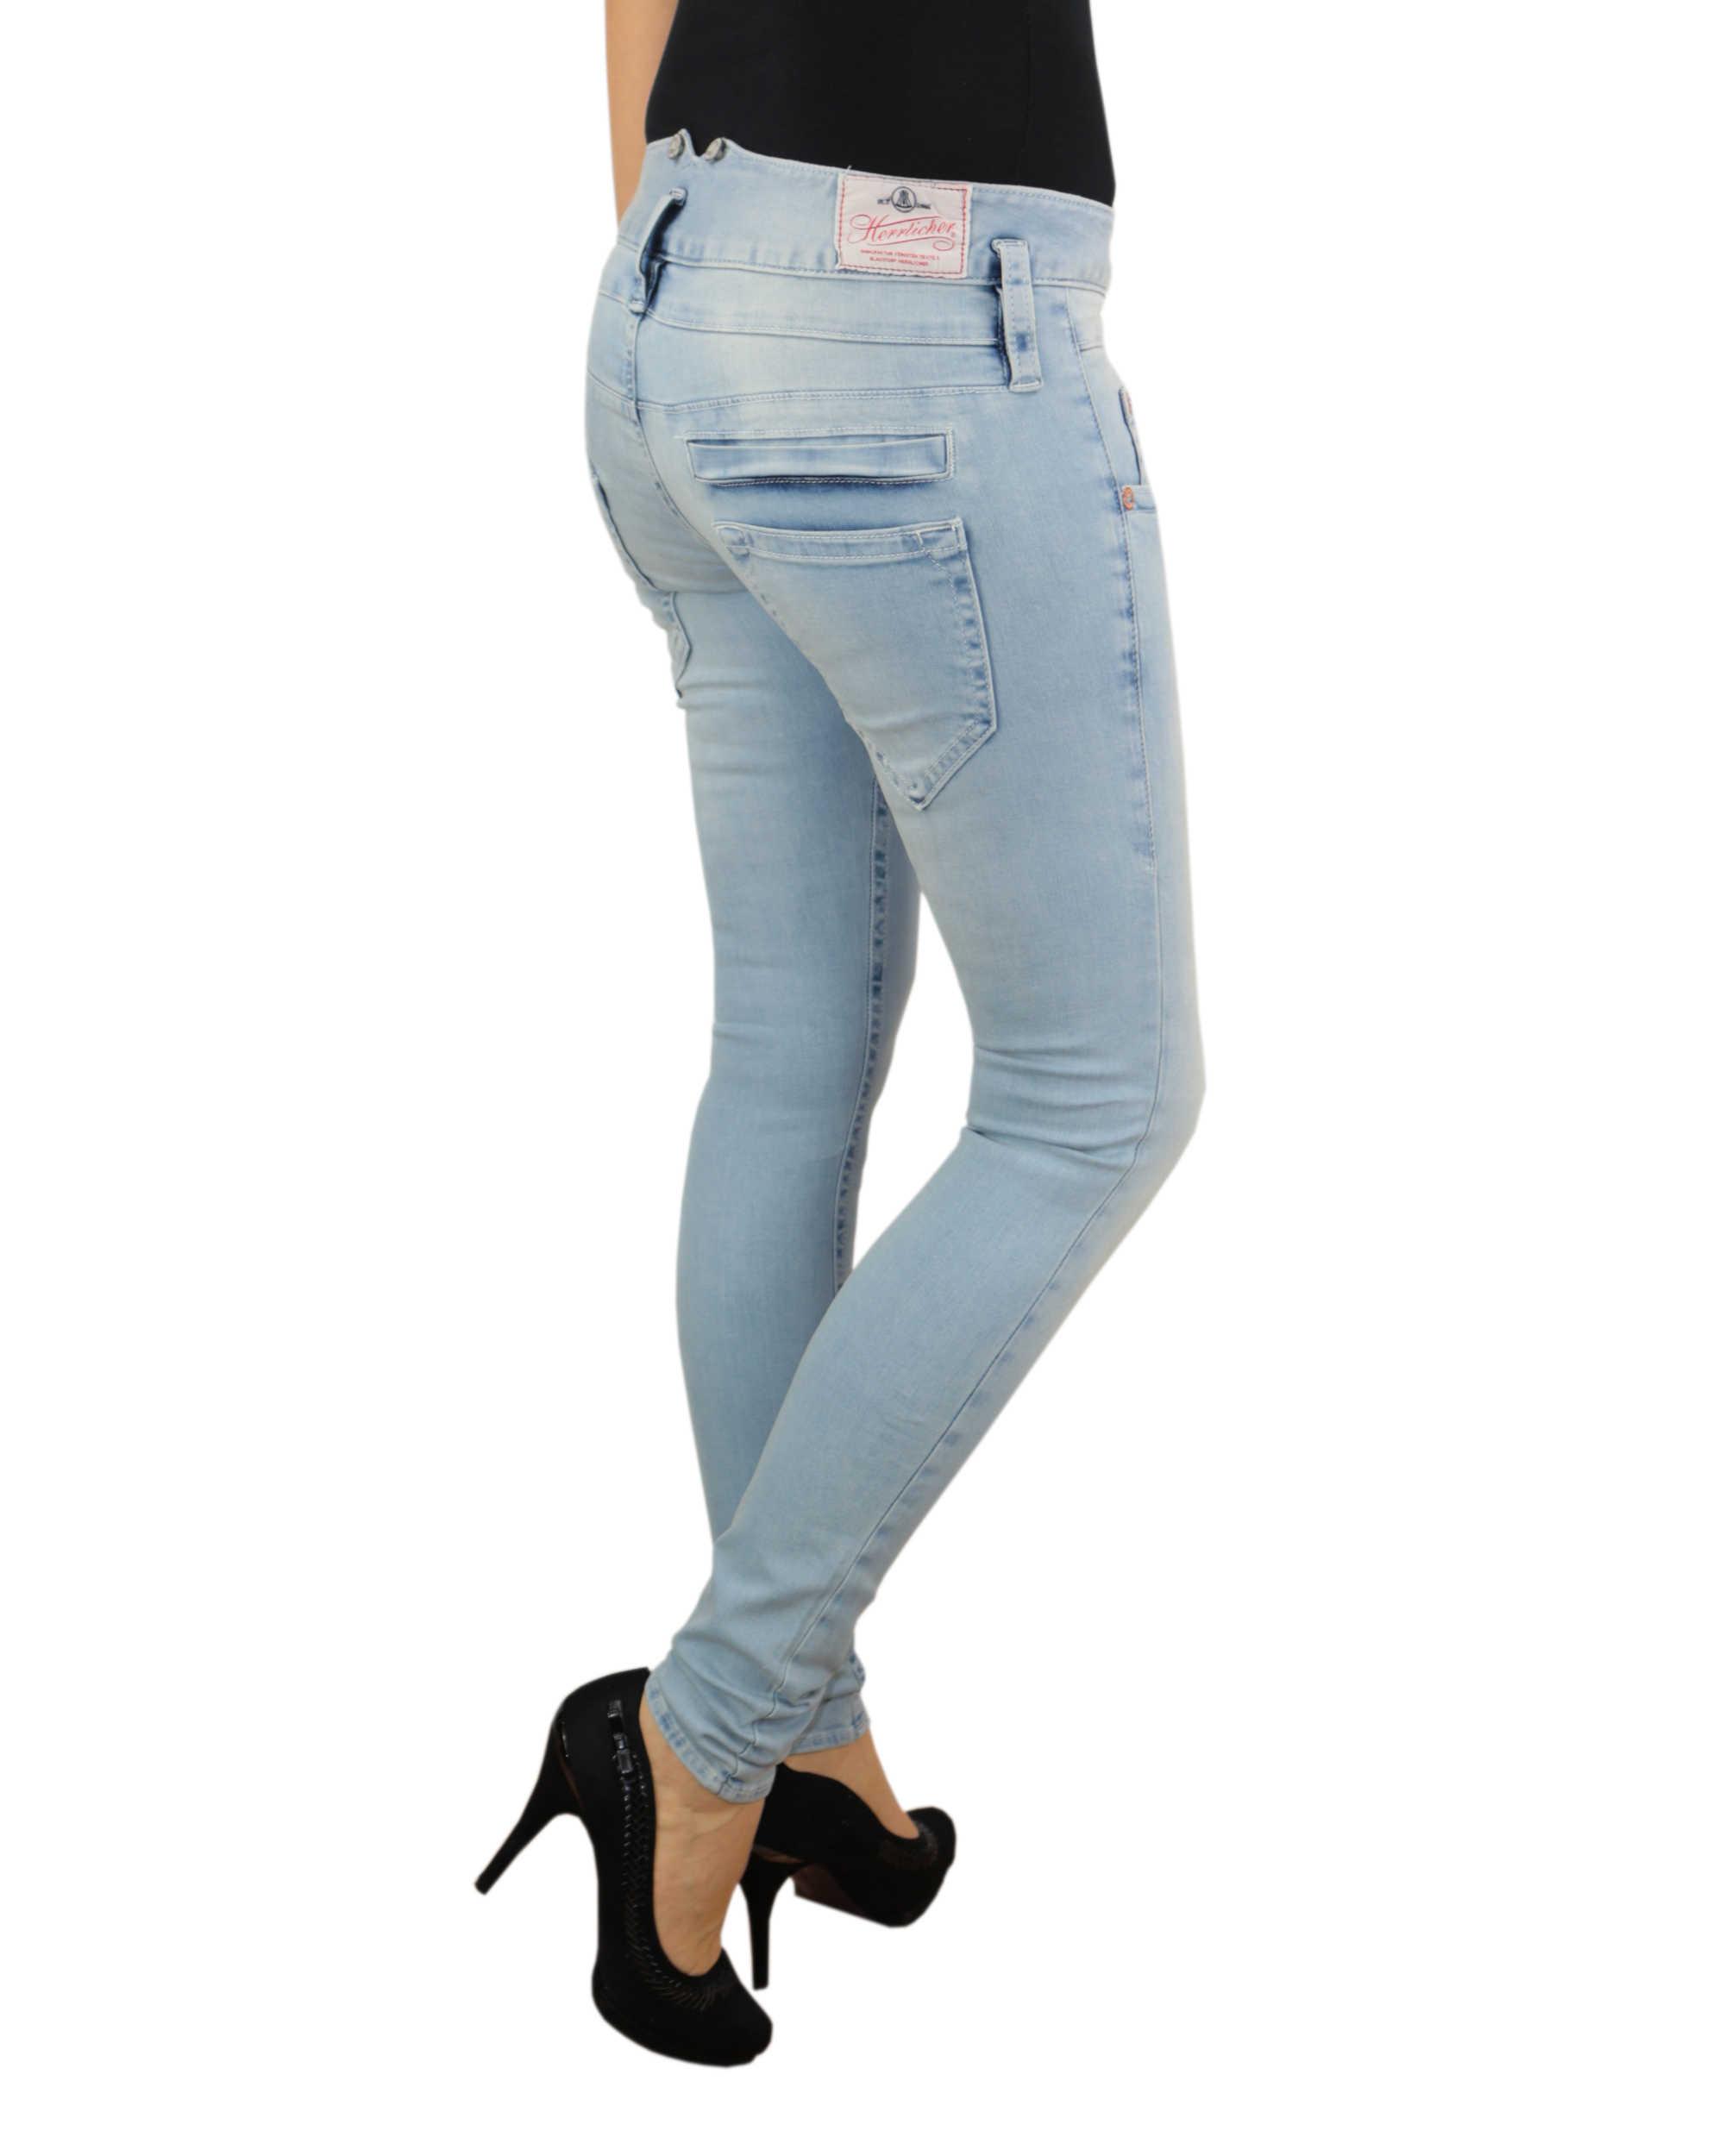 herrlicher damen jeans pitch slim 5303 d9668 723 ice denim. Black Bedroom Furniture Sets. Home Design Ideas